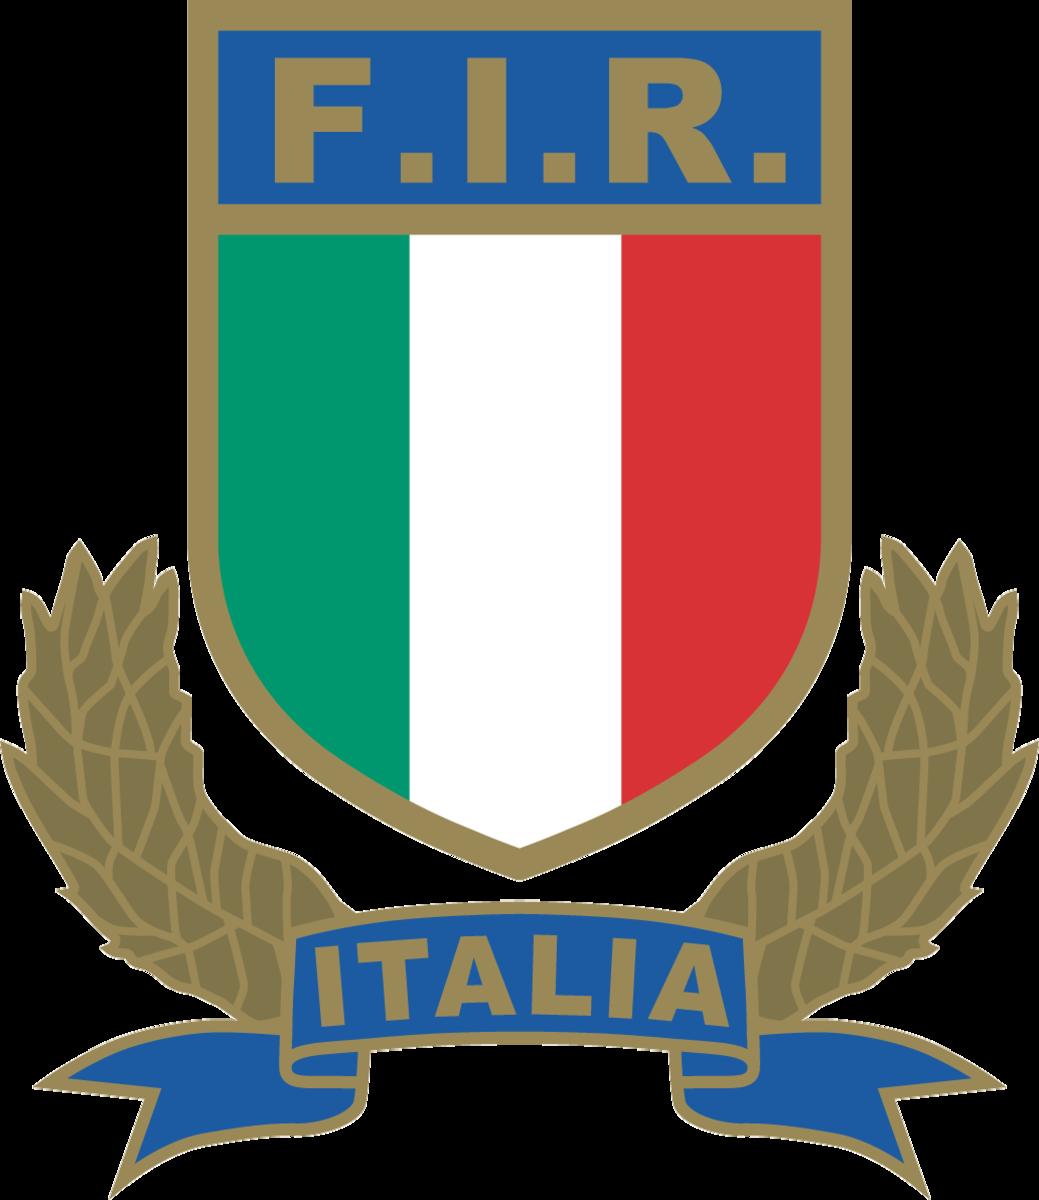 The Italian Rugby Emblem